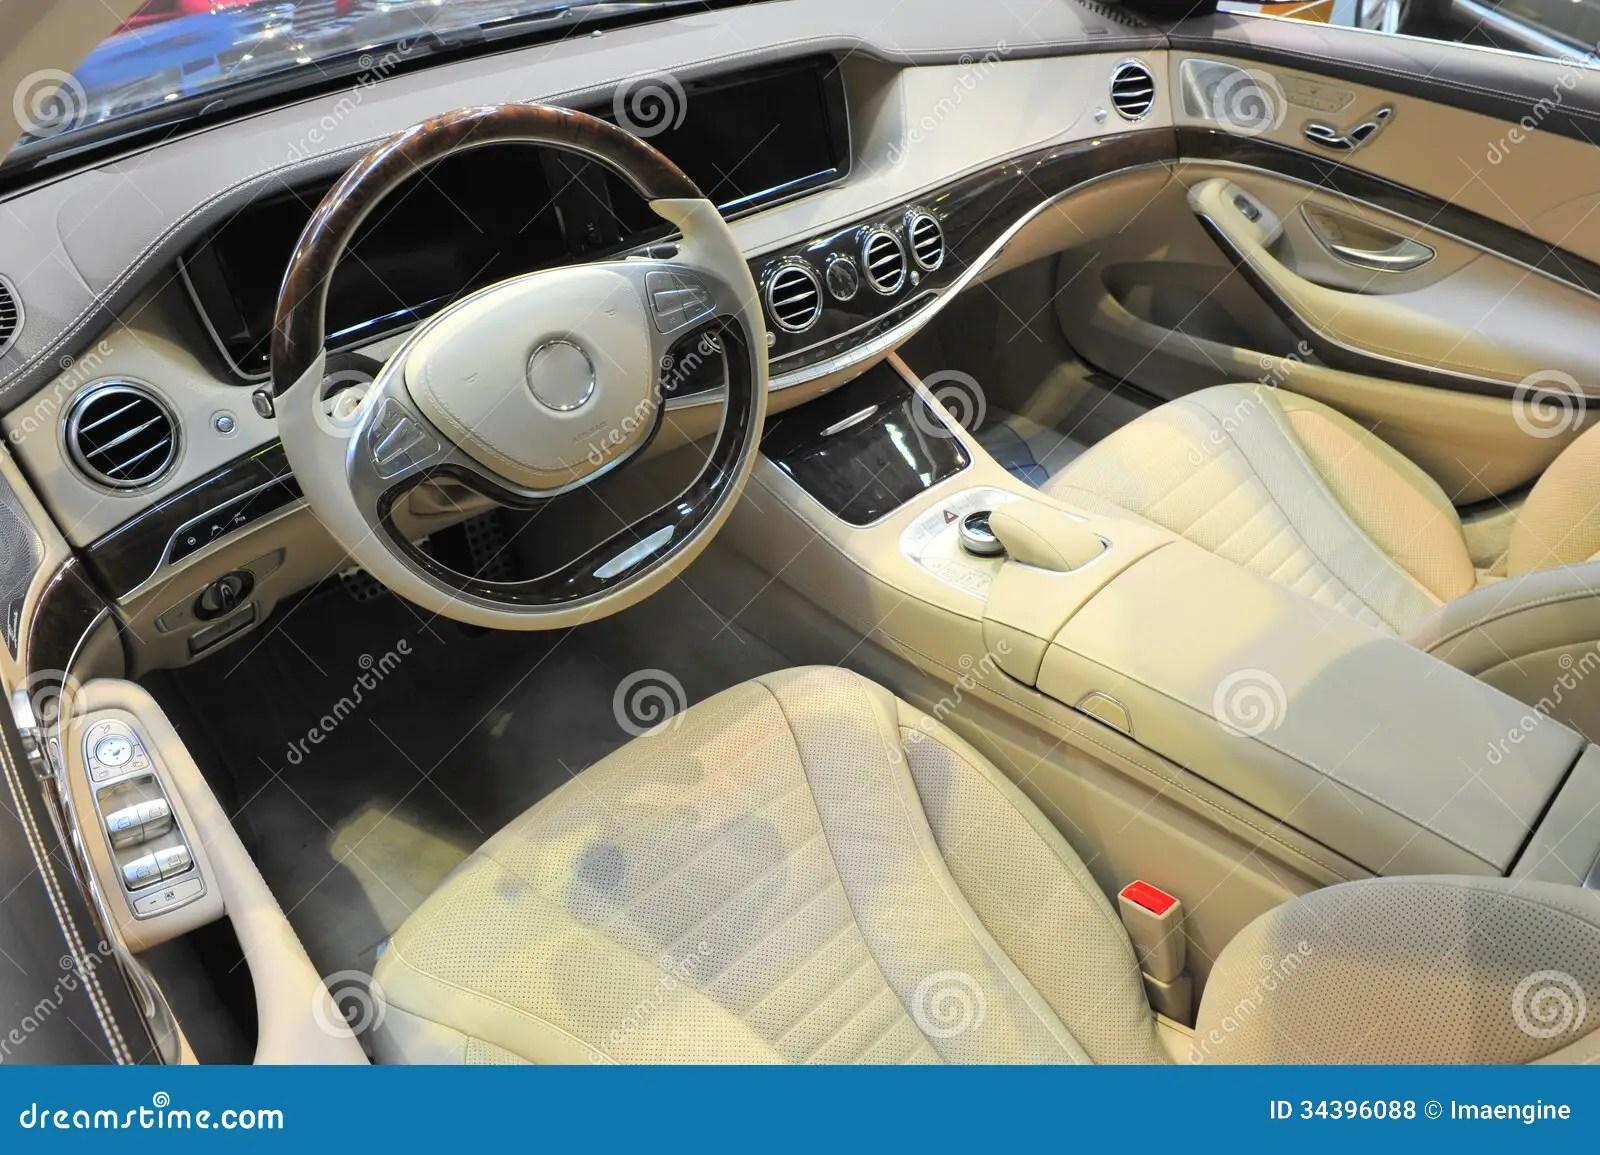 2014 Mercedes Benz S Klasse Luxurious Interior Det Royalty